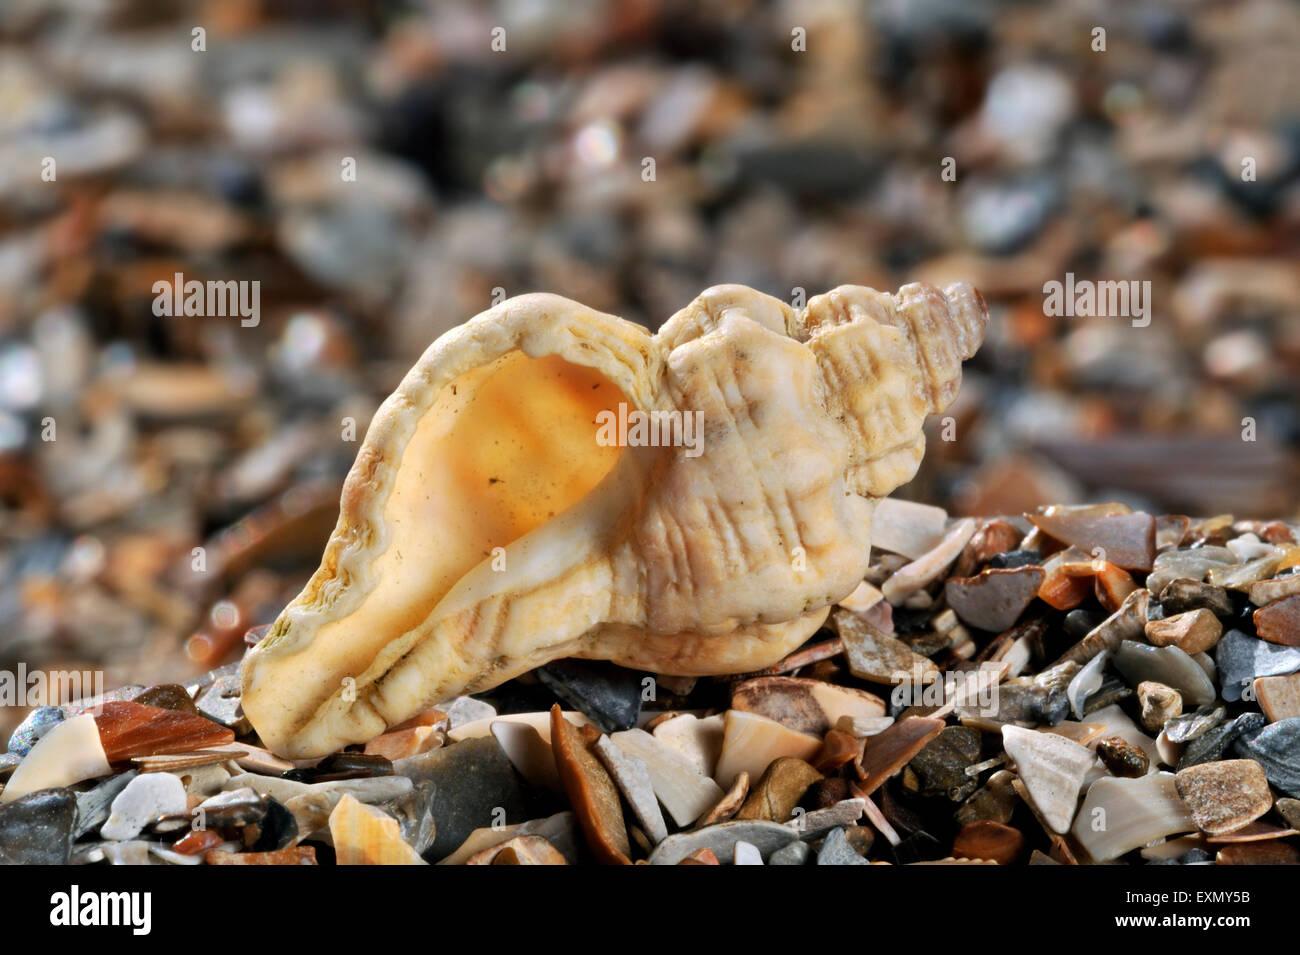 Sting winkle / Oyster drill / Hedgehog Murex (Ocenebra erinacea) washed on beach Stock Photo